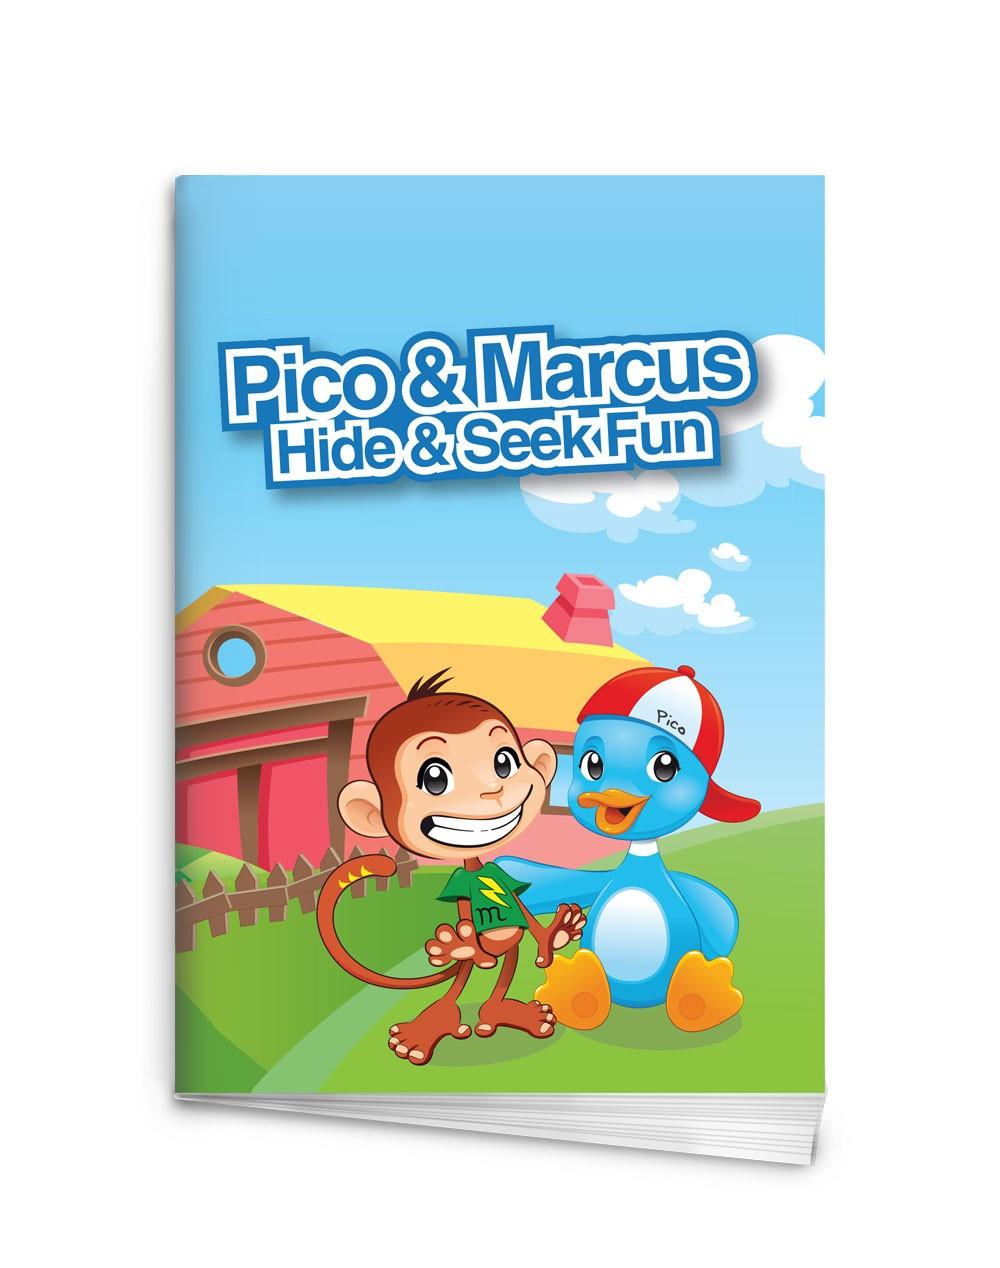 Pico & Marcus Hide & Seek Fun Book